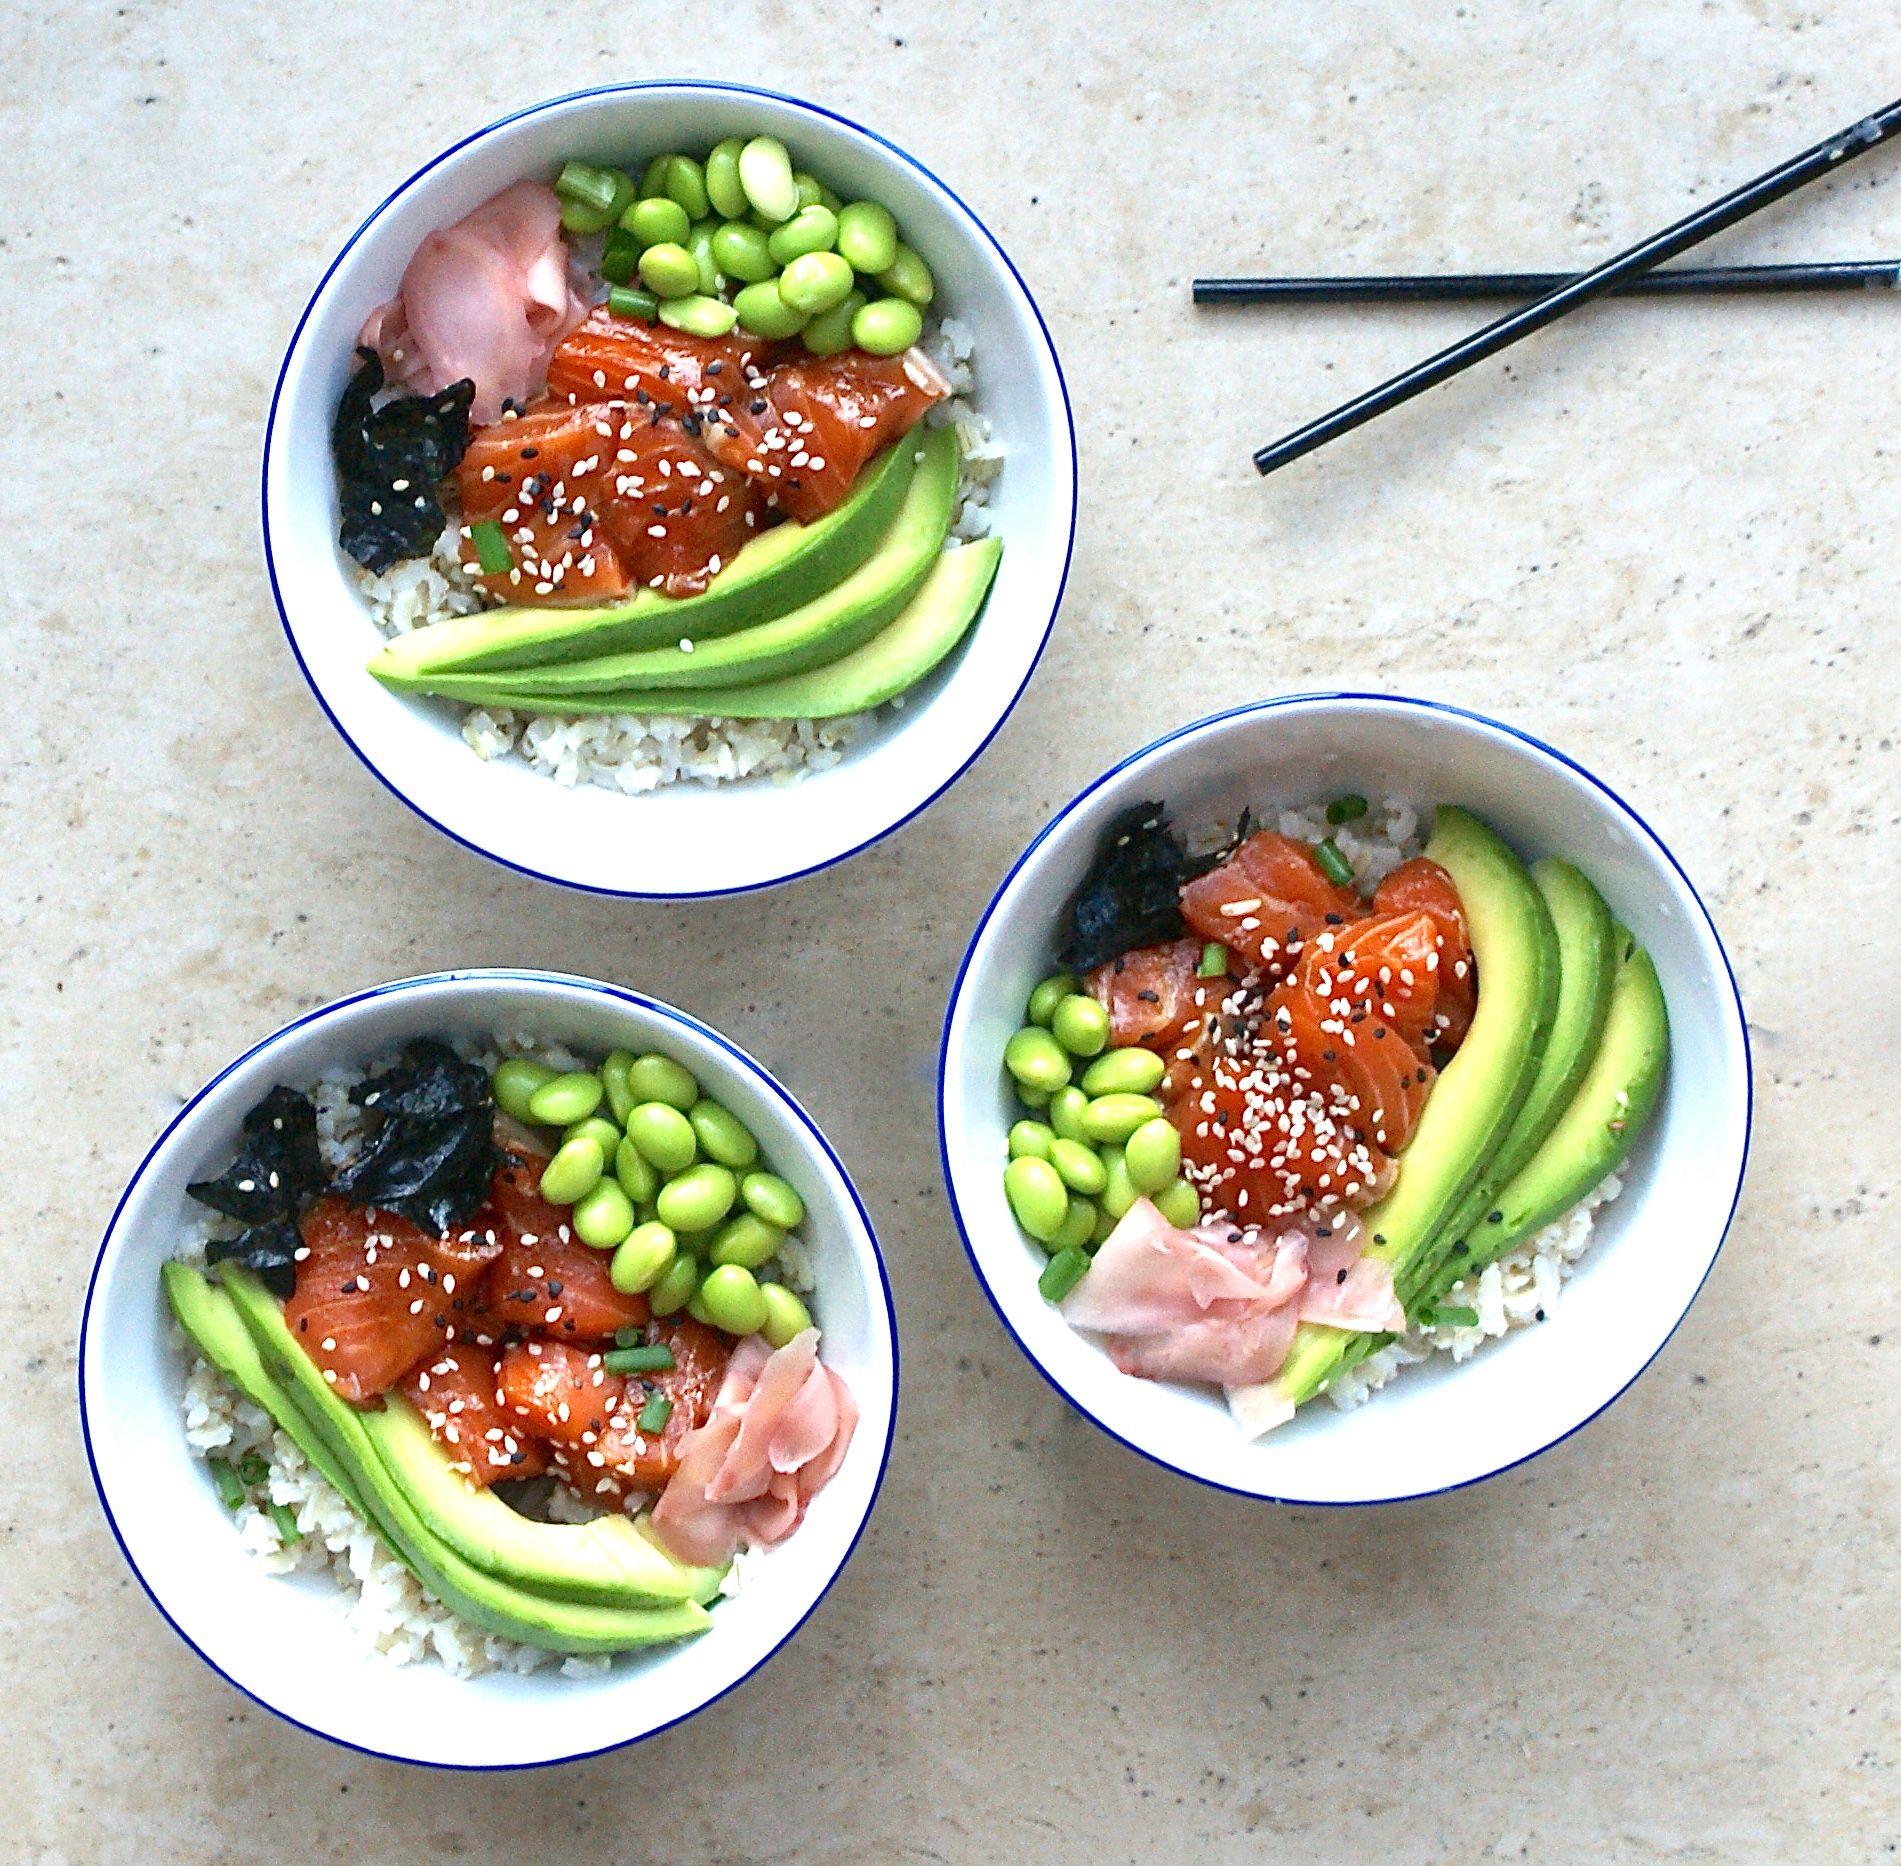 brown rice sushi bowls | Brown rice sushi bowls | The Cashew Tree